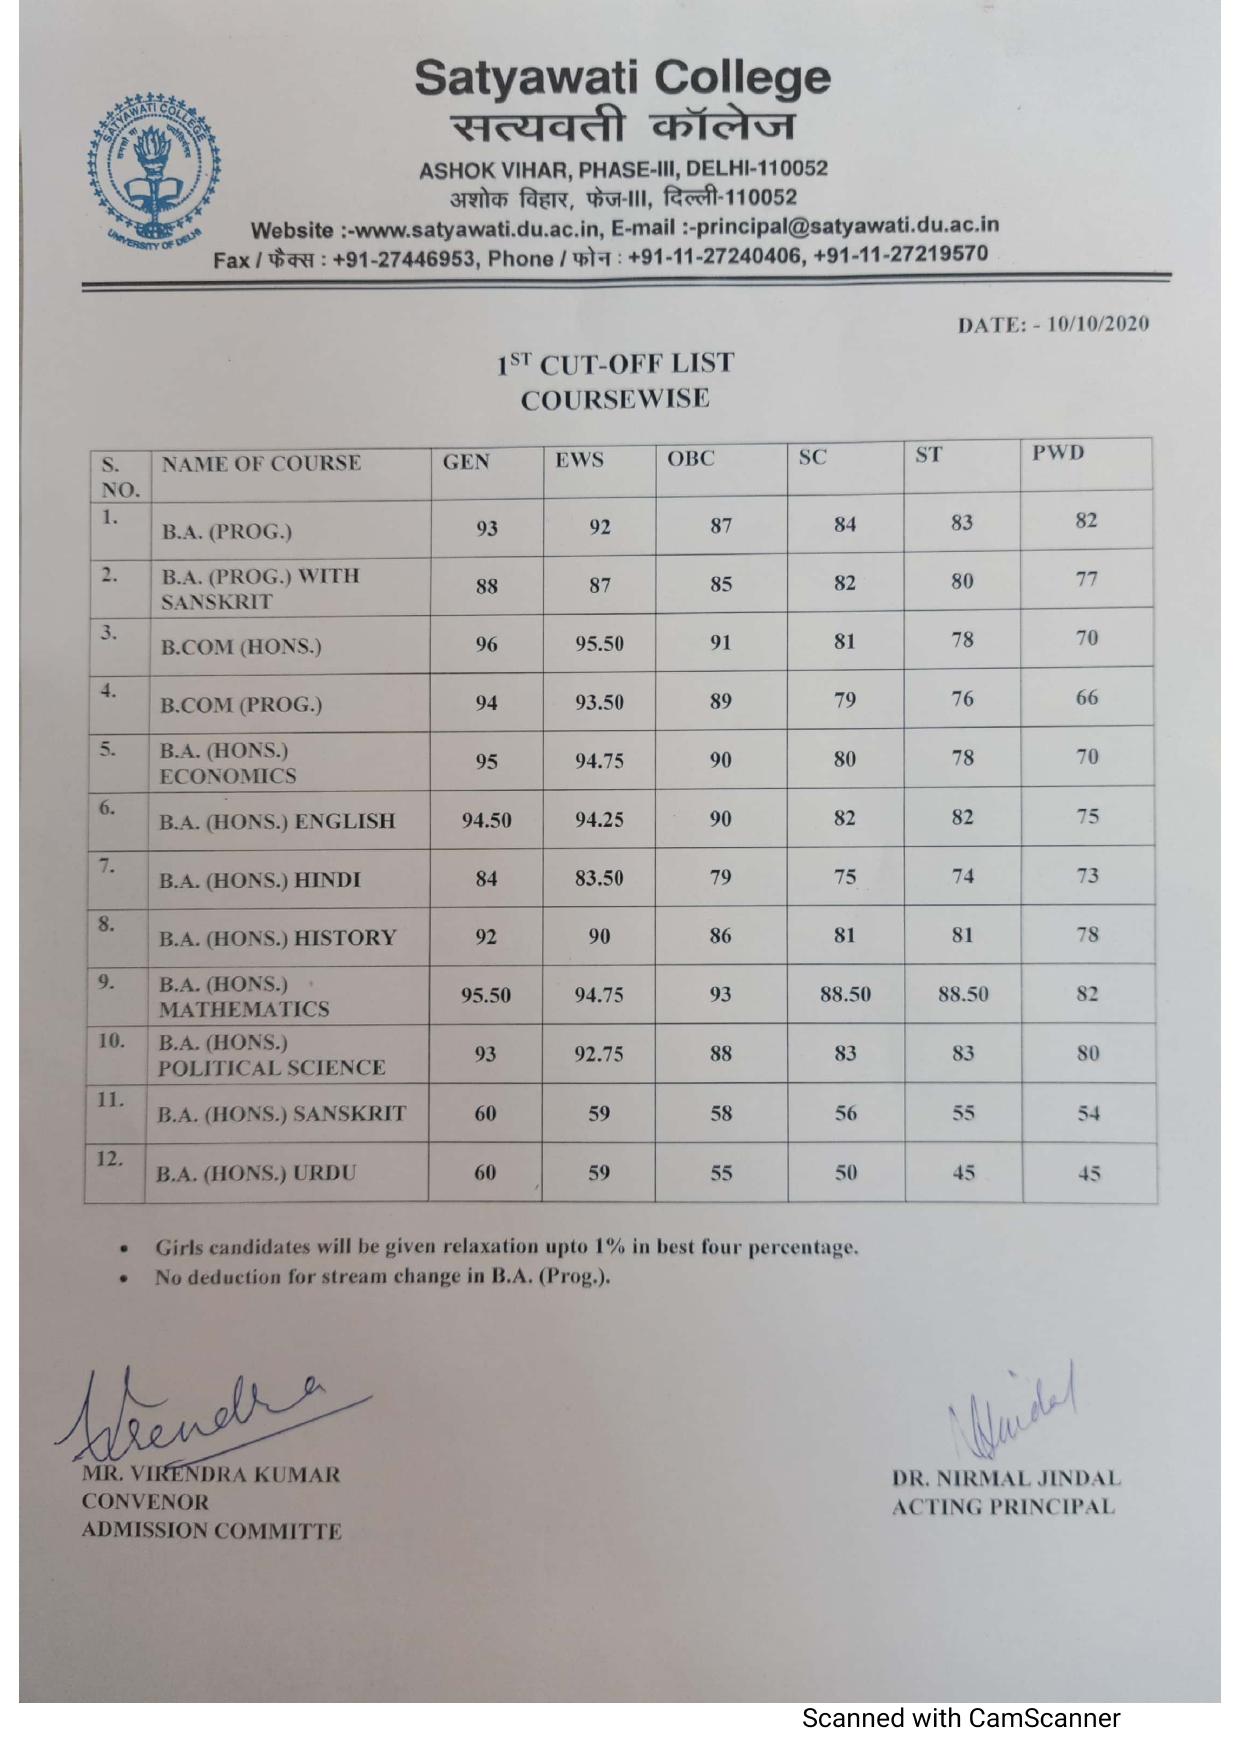 Du First Cut of 2020 for Satyavati College